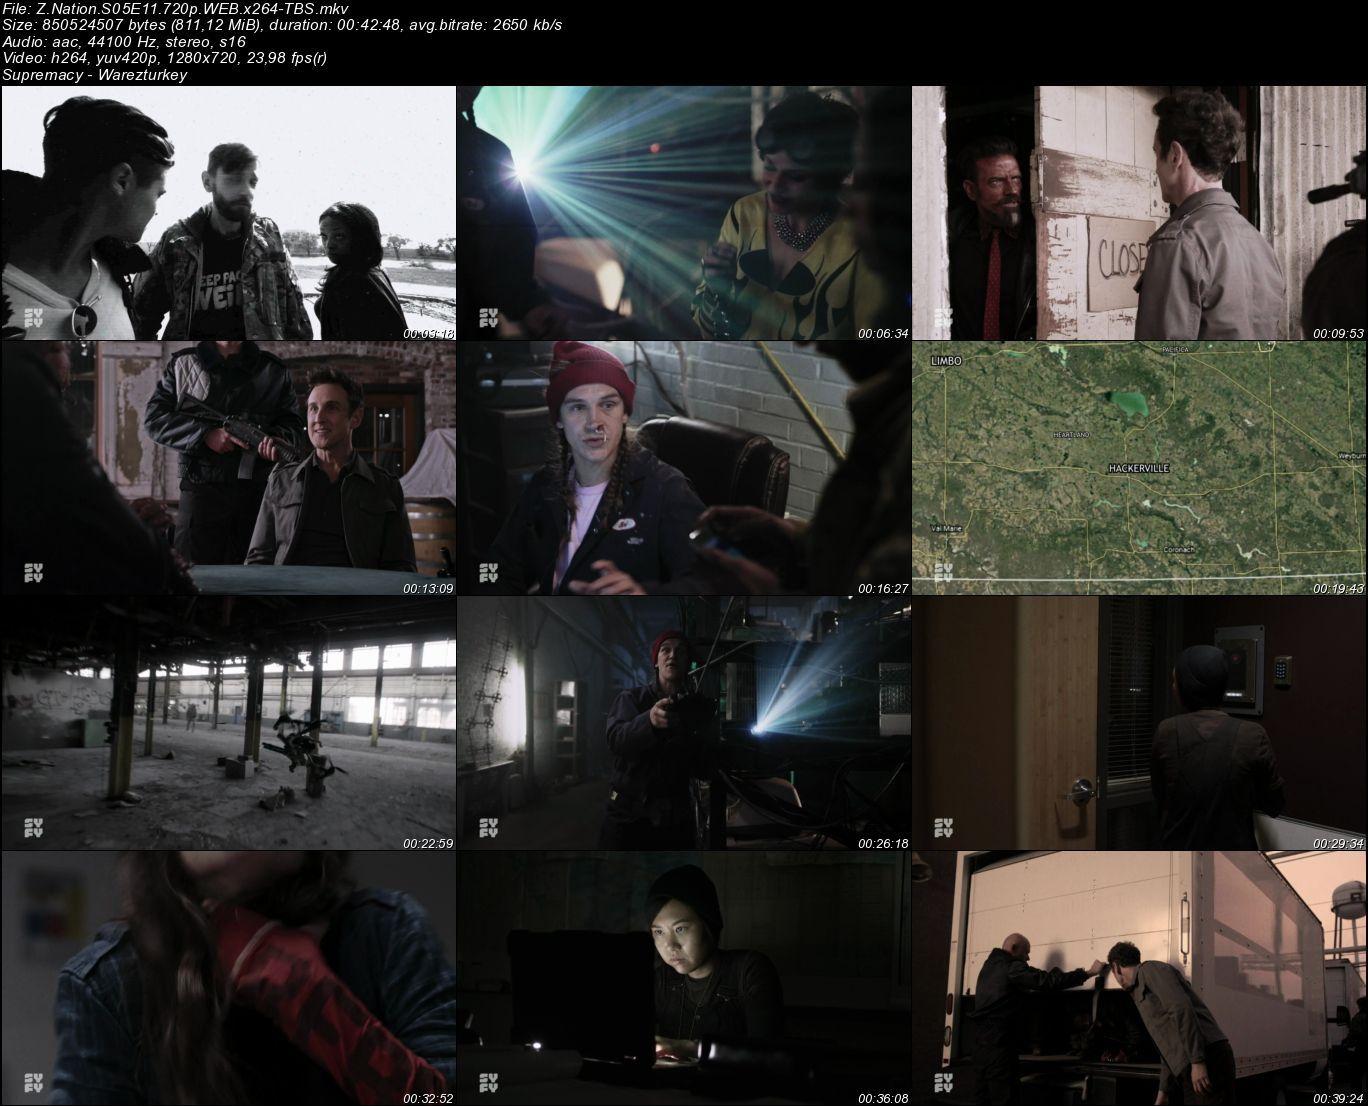 Z Nation - Sezon 5 - 720p HDTV - Türkçe Altyazılı